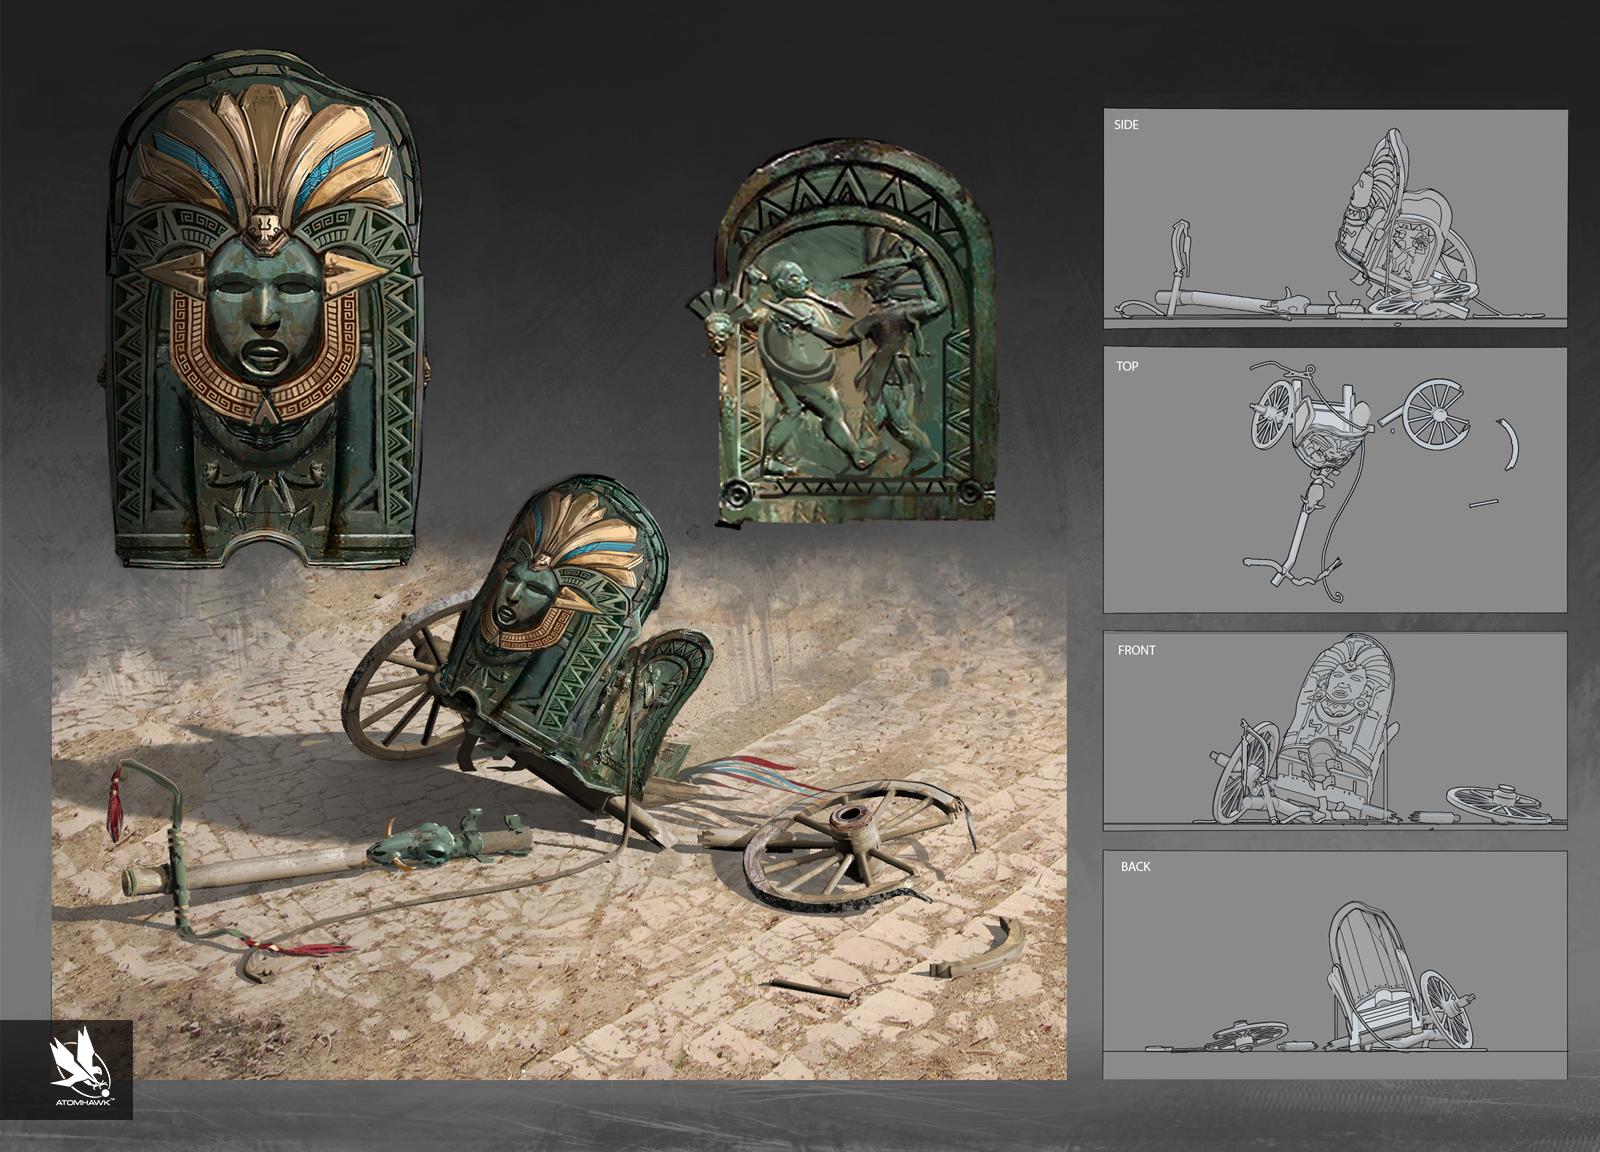 Atomhawk_Warner-Bros-NetherRealm_Mortal-Kombat-11_Concept-Art_Prop-Design_Kotal's_Arena_Breakout_E.jpg